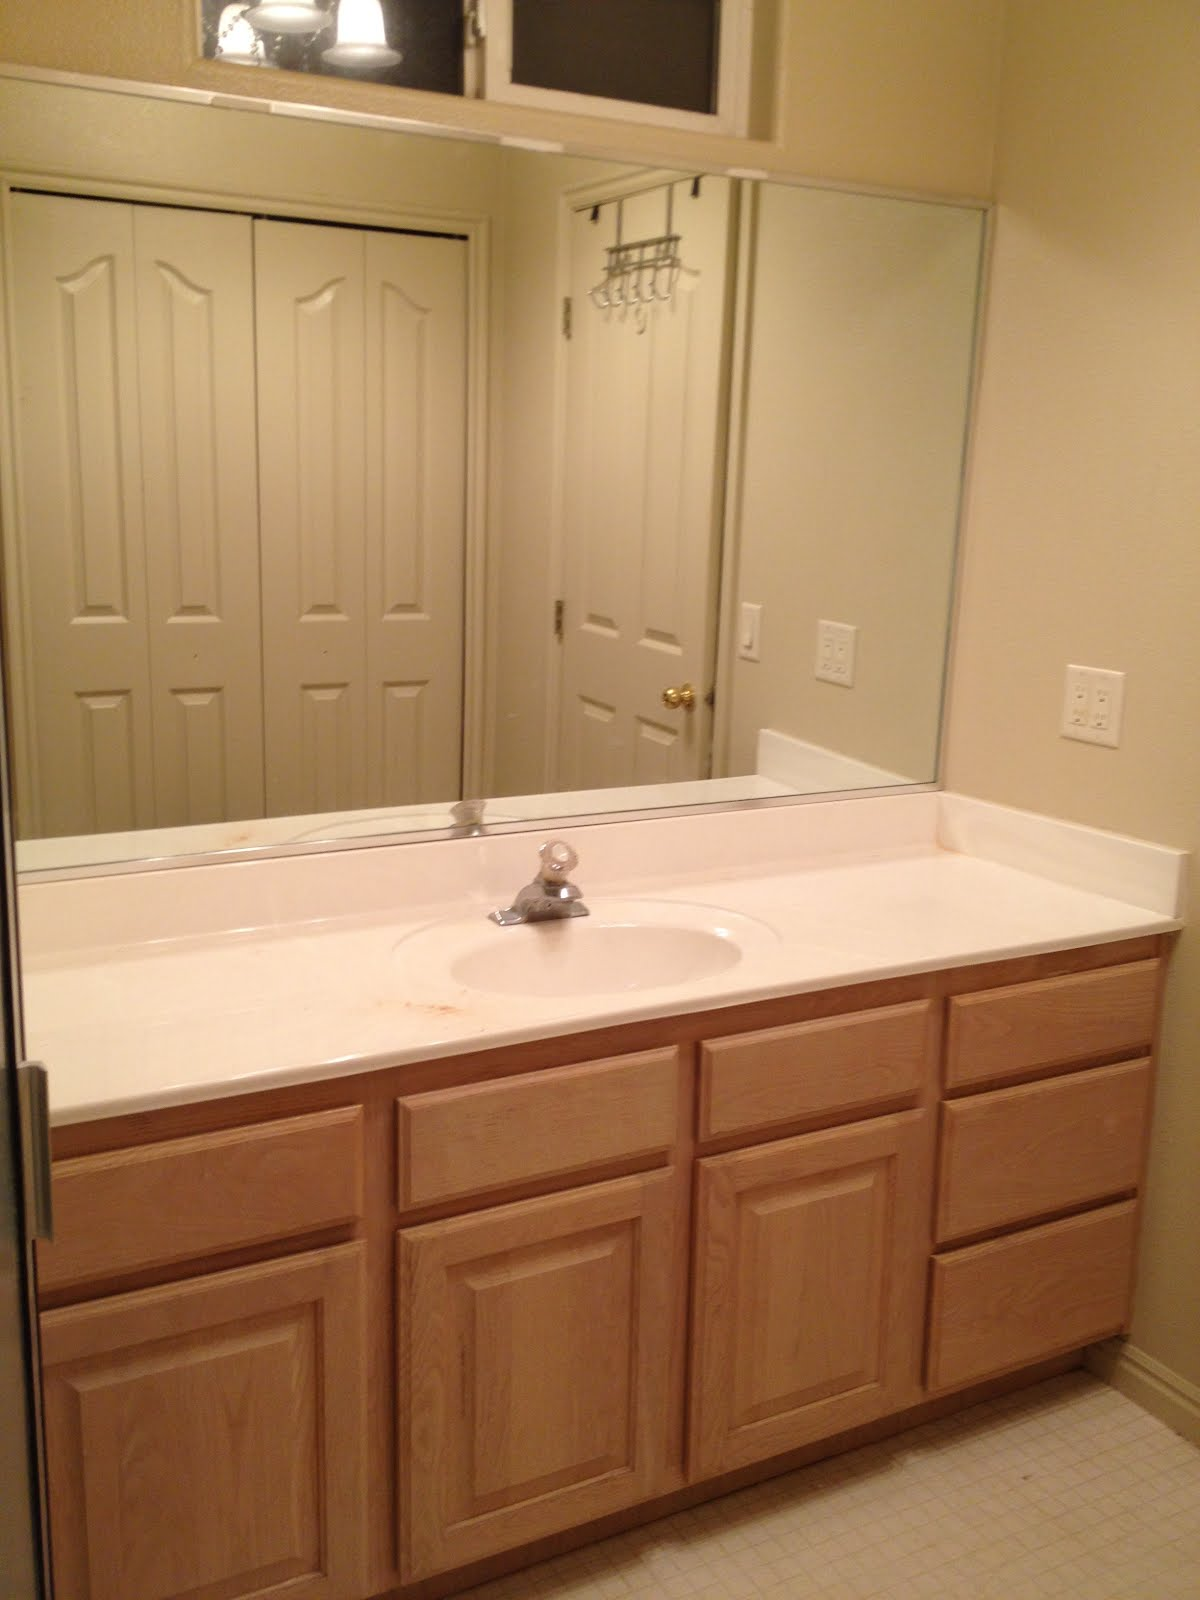 Garage sales r us mirror replacement - Replacement bathroom mirror glass ...